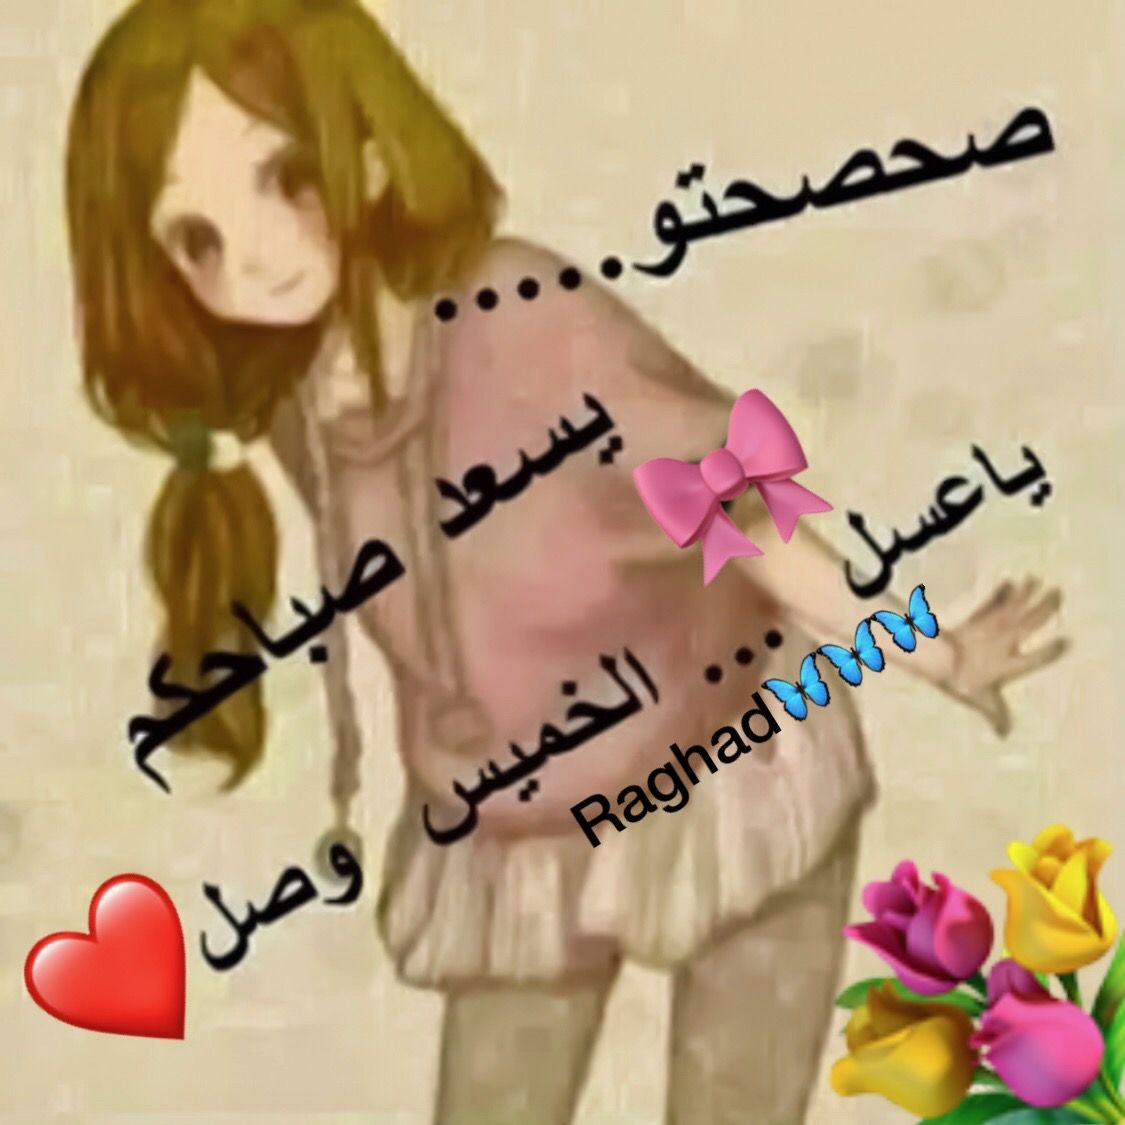 Desertrose صباح الخميس الونيس Cute Wallpapers Inspirational Quotes Arabic Quotes